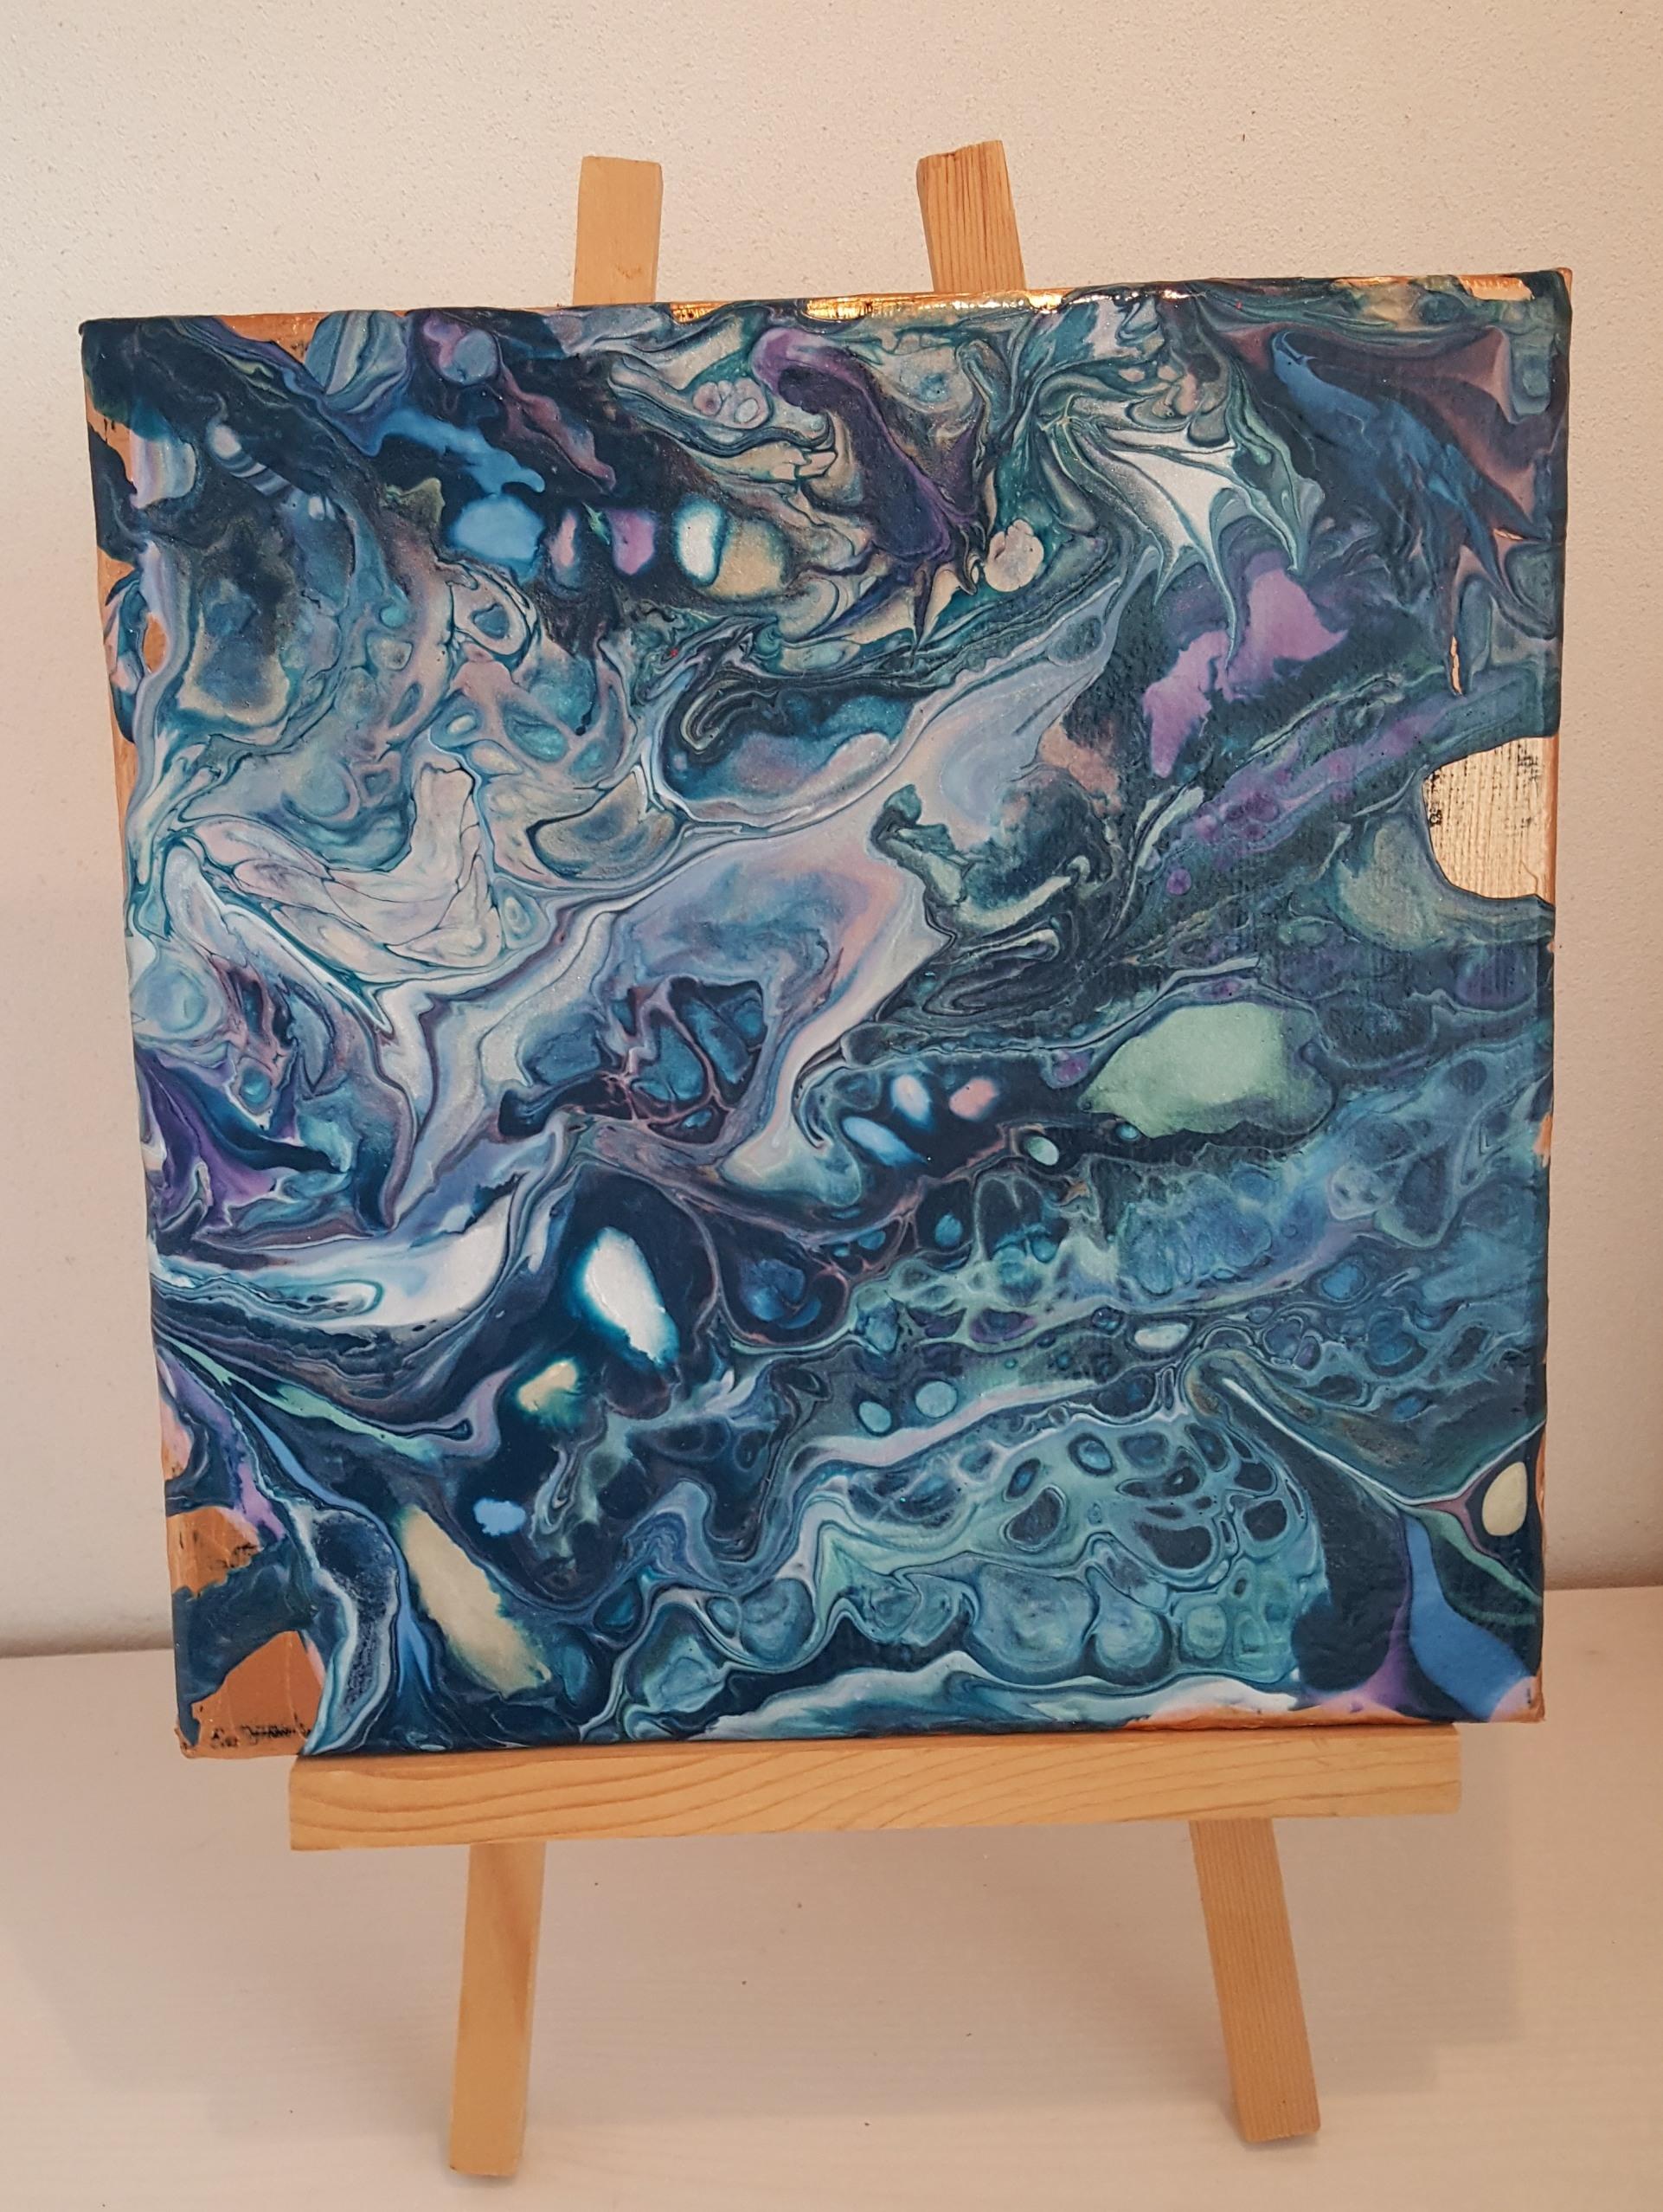 HI Art Medium - Blue Colored